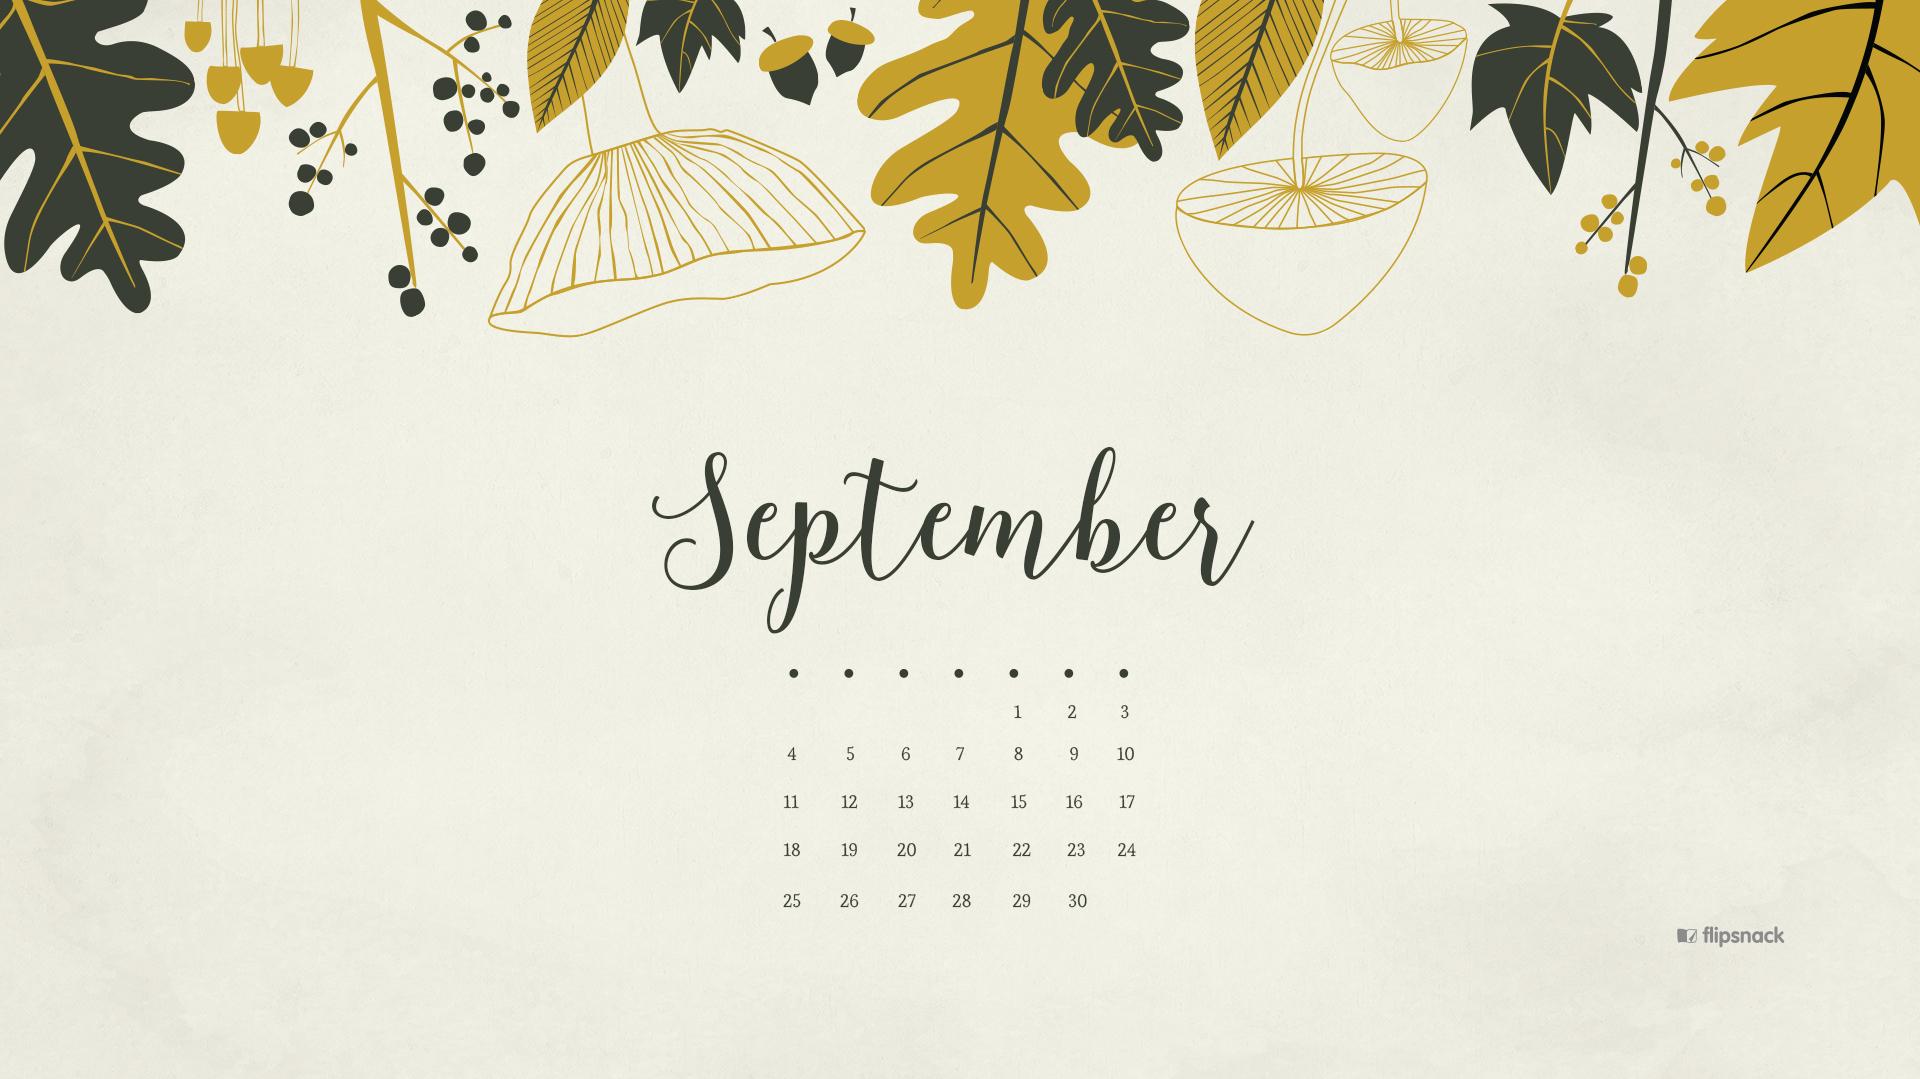 september 2016 free calendar desktop wallpaper